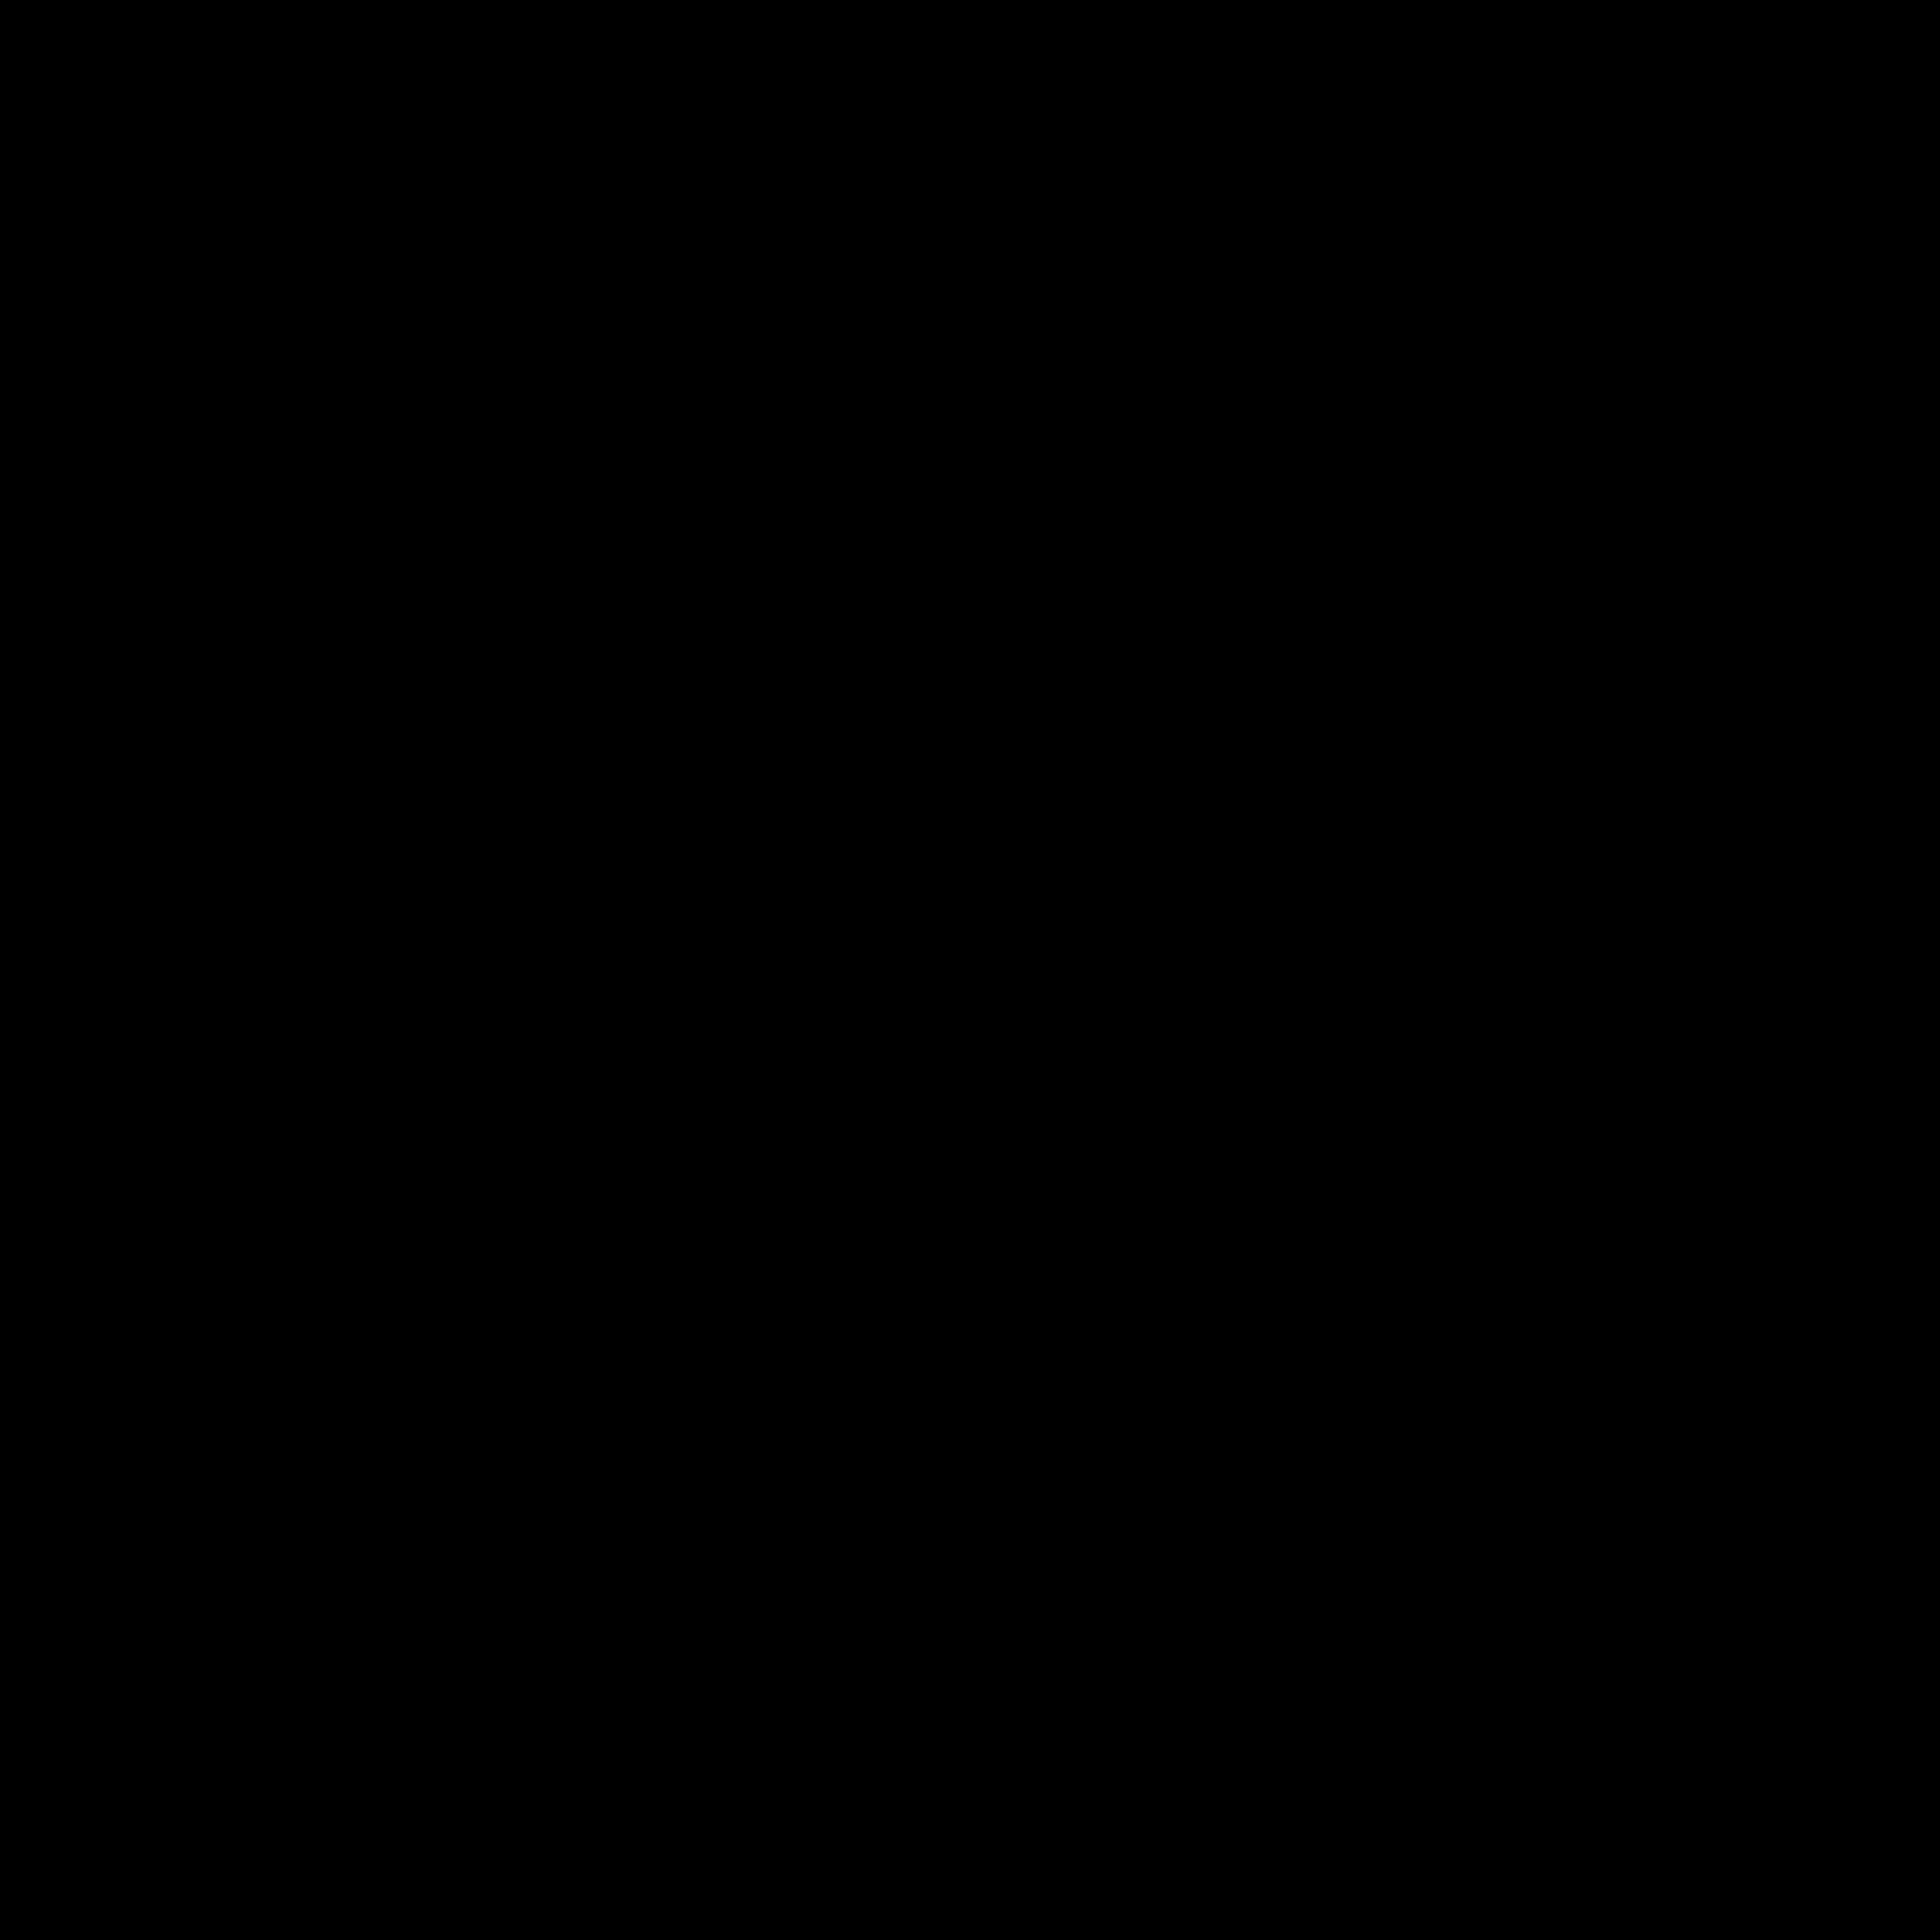 Victorian Frame PNG - 54446